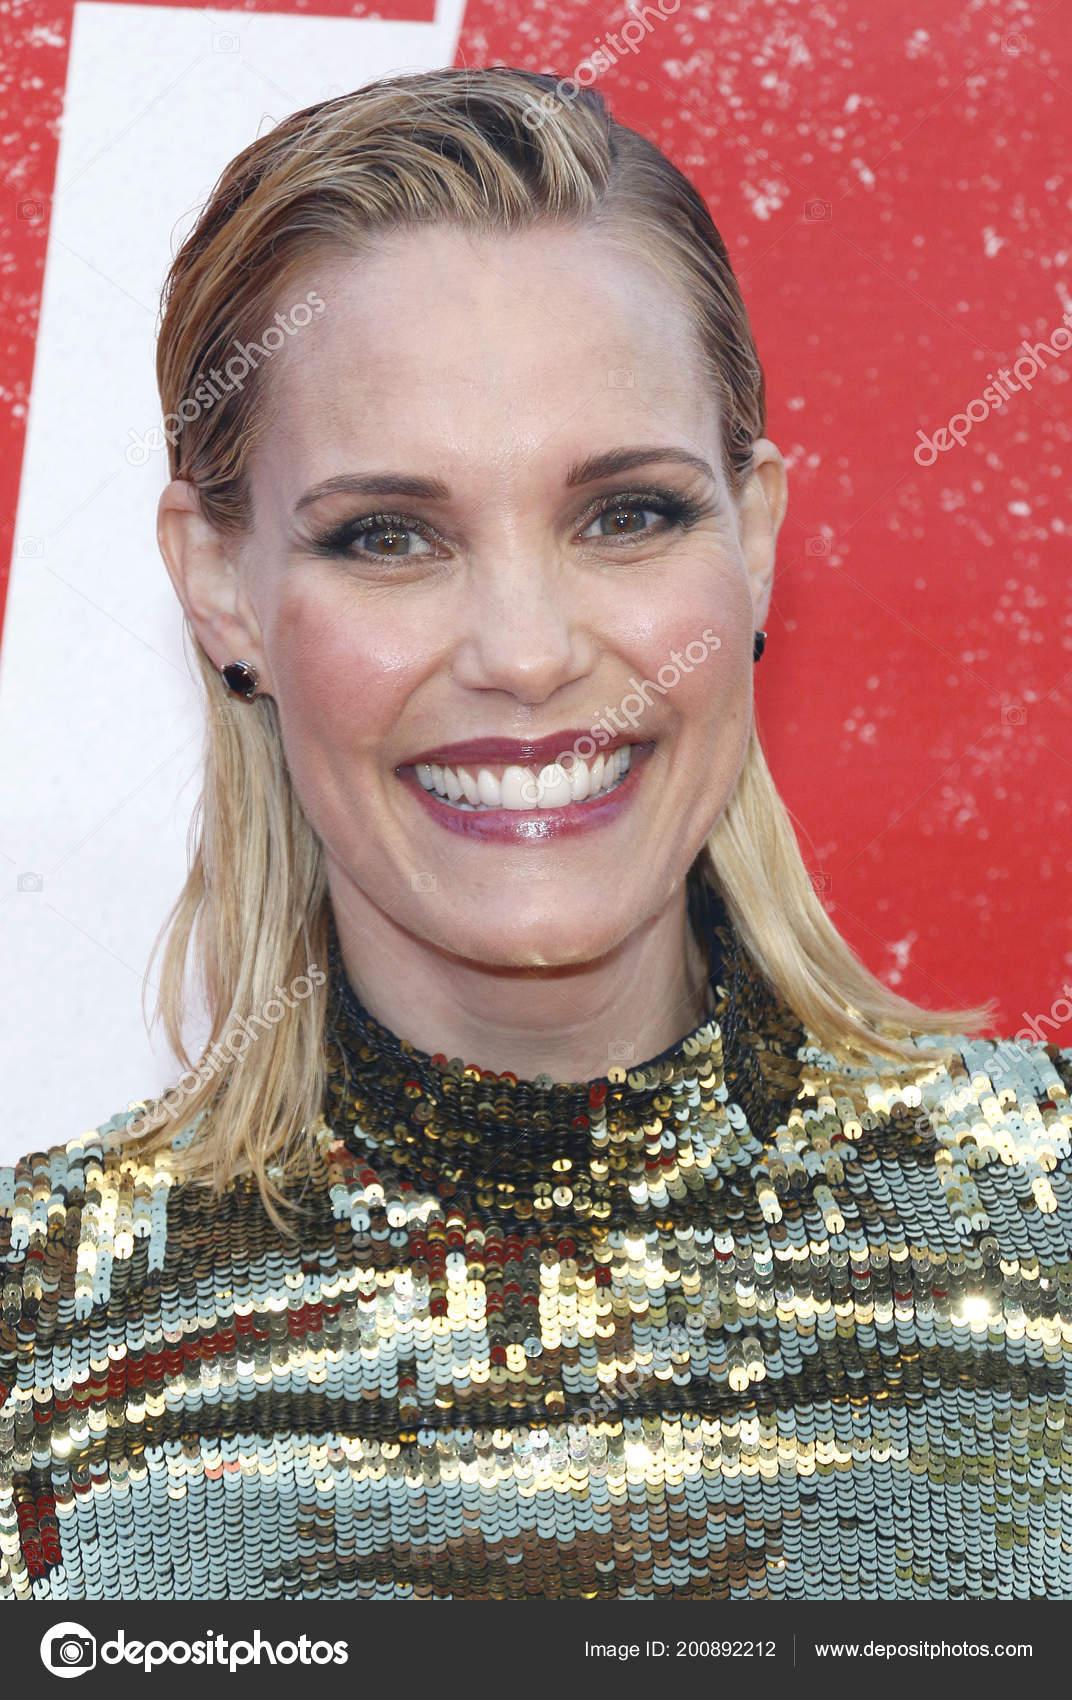 Helen Hunt born June 15, 1963 (age 55),Nicole Berger (American actress) Sex videos Lex Scott Davis,Sarah Shahi